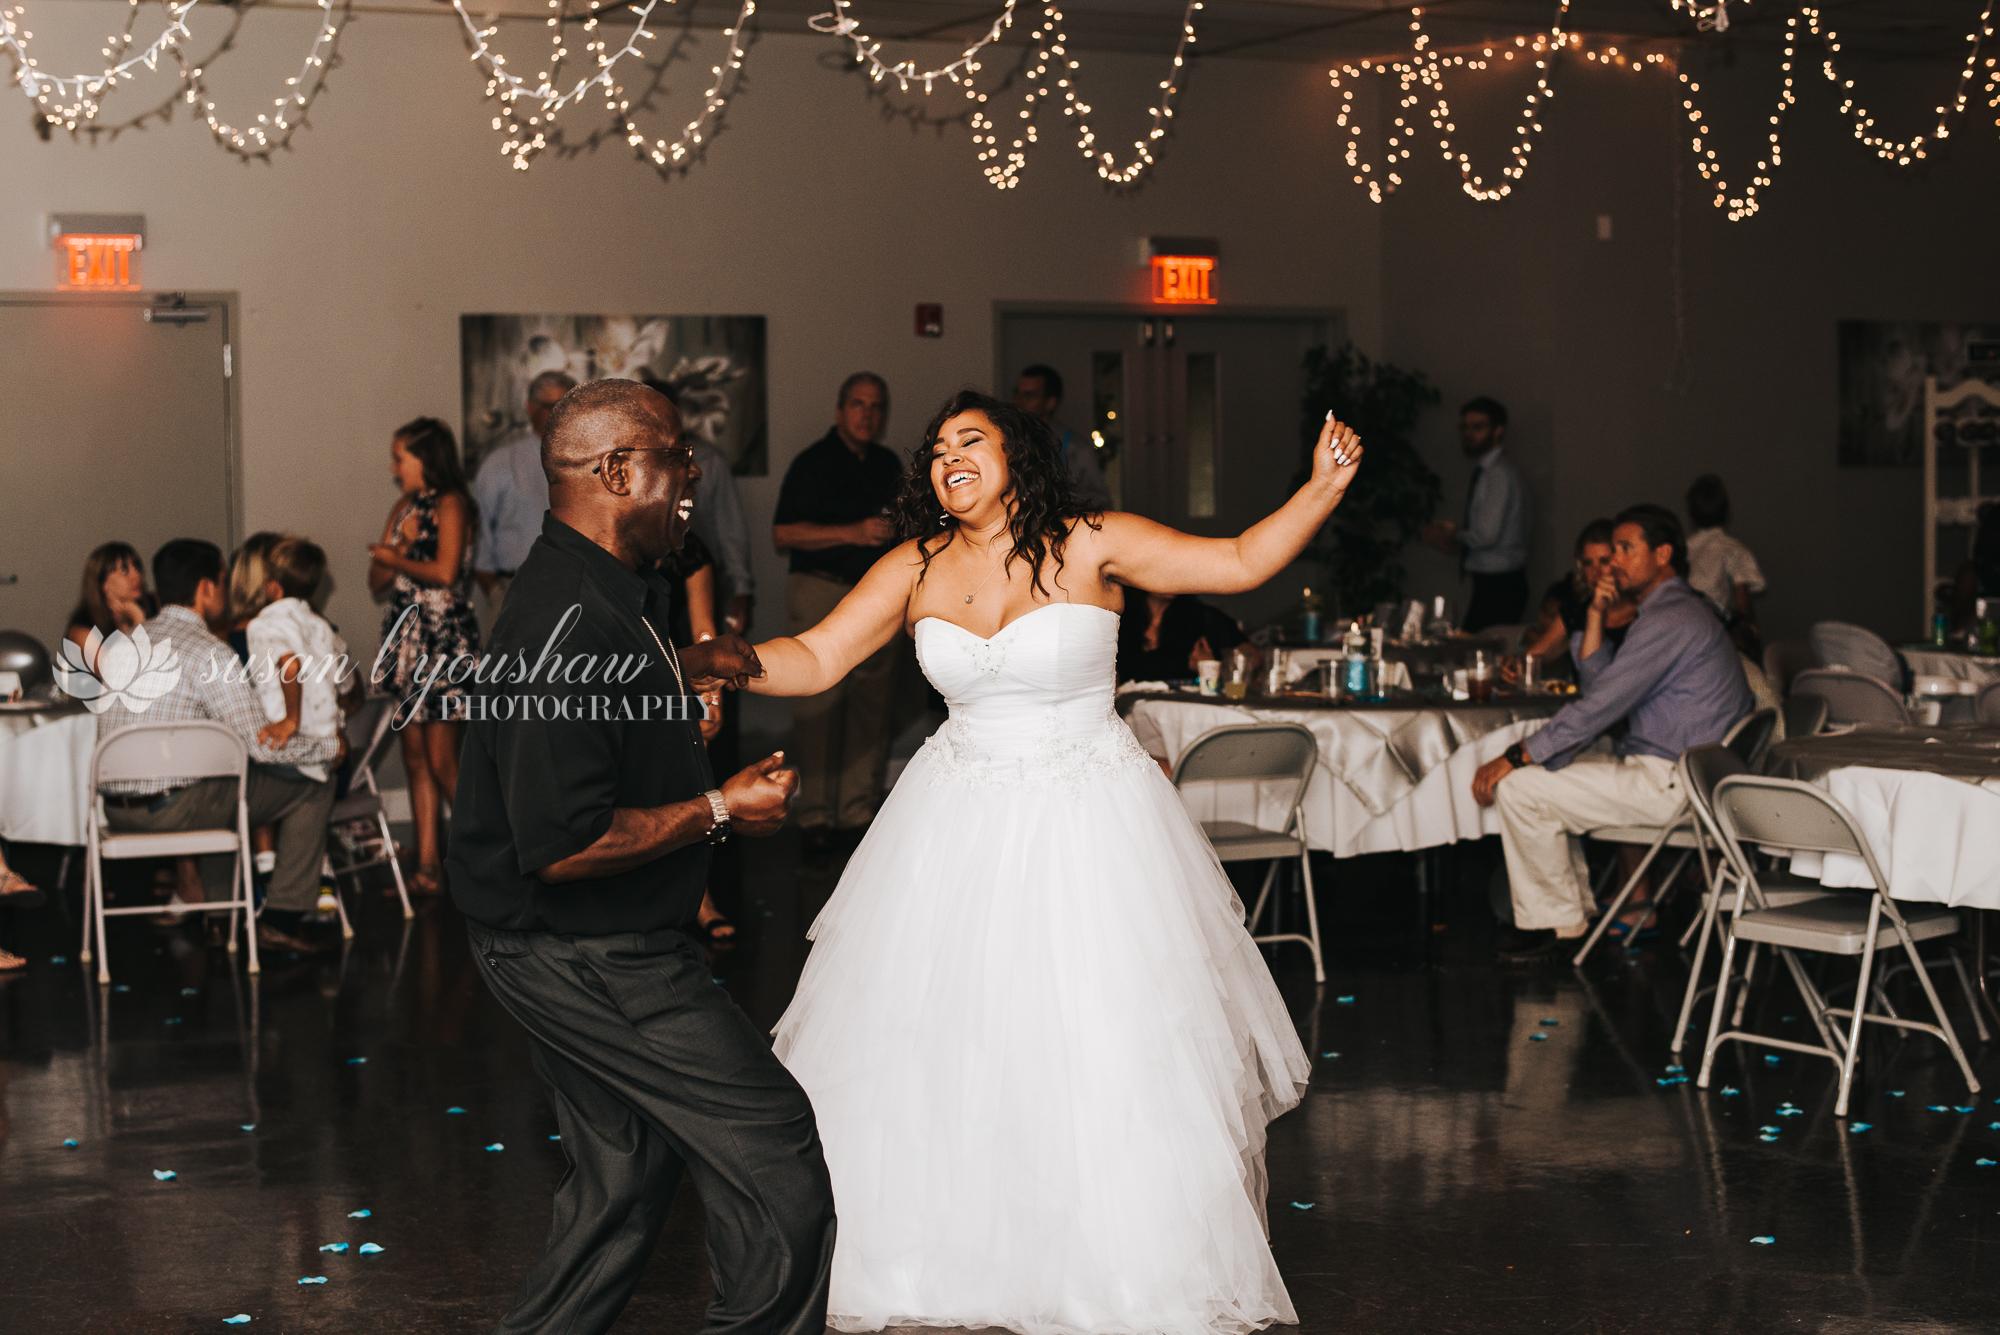 Katelyn and Wes Wedding Photos 07-13-2019 SLY Photography-117.jpg